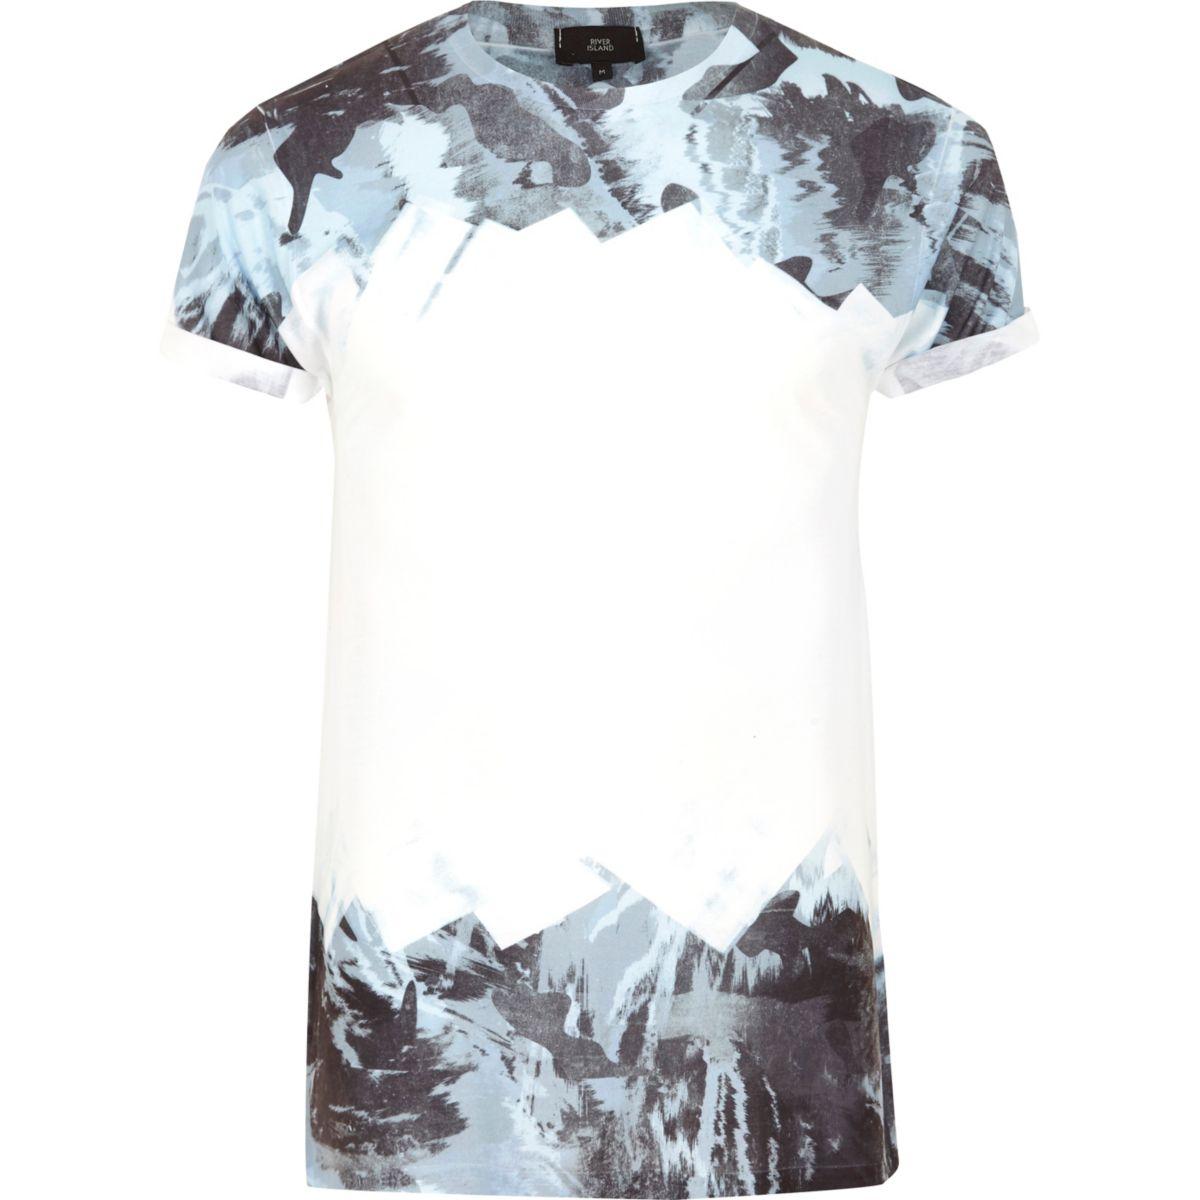 White and blue camo fade print T-shirt